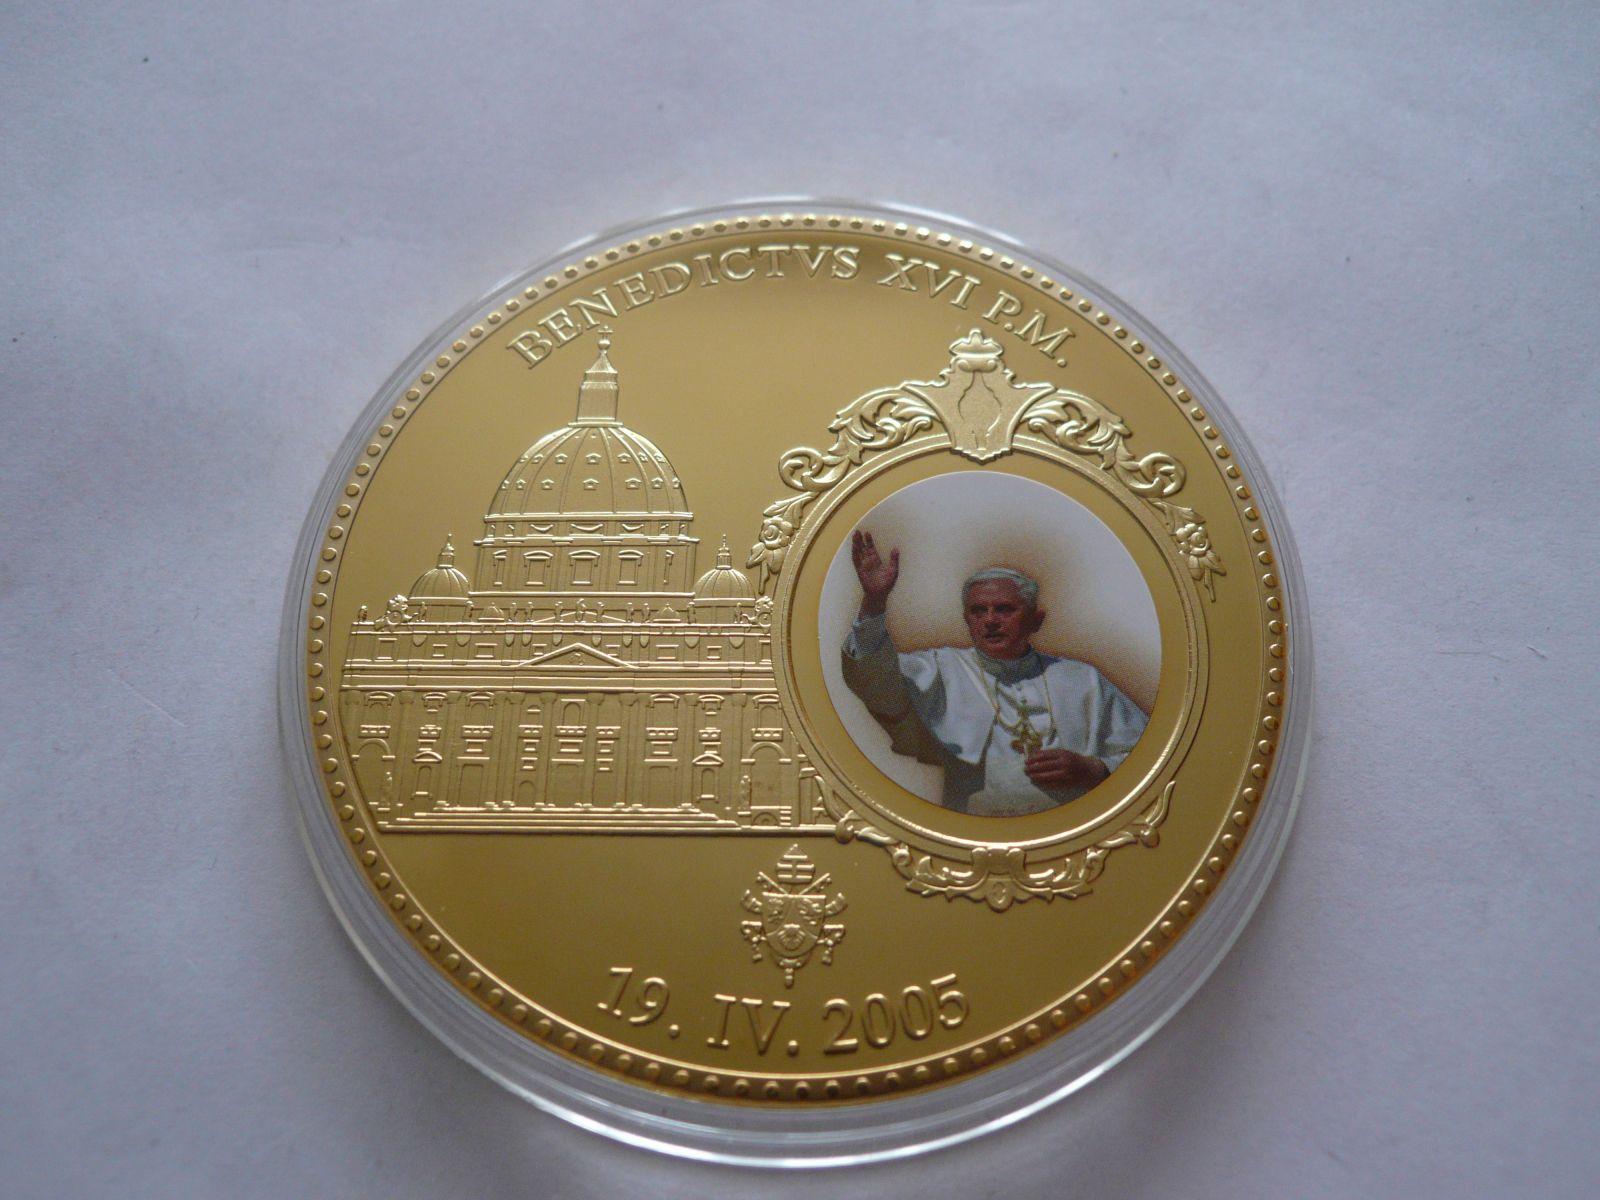 papež Benedikt XVI. průměr 70mm, ČR